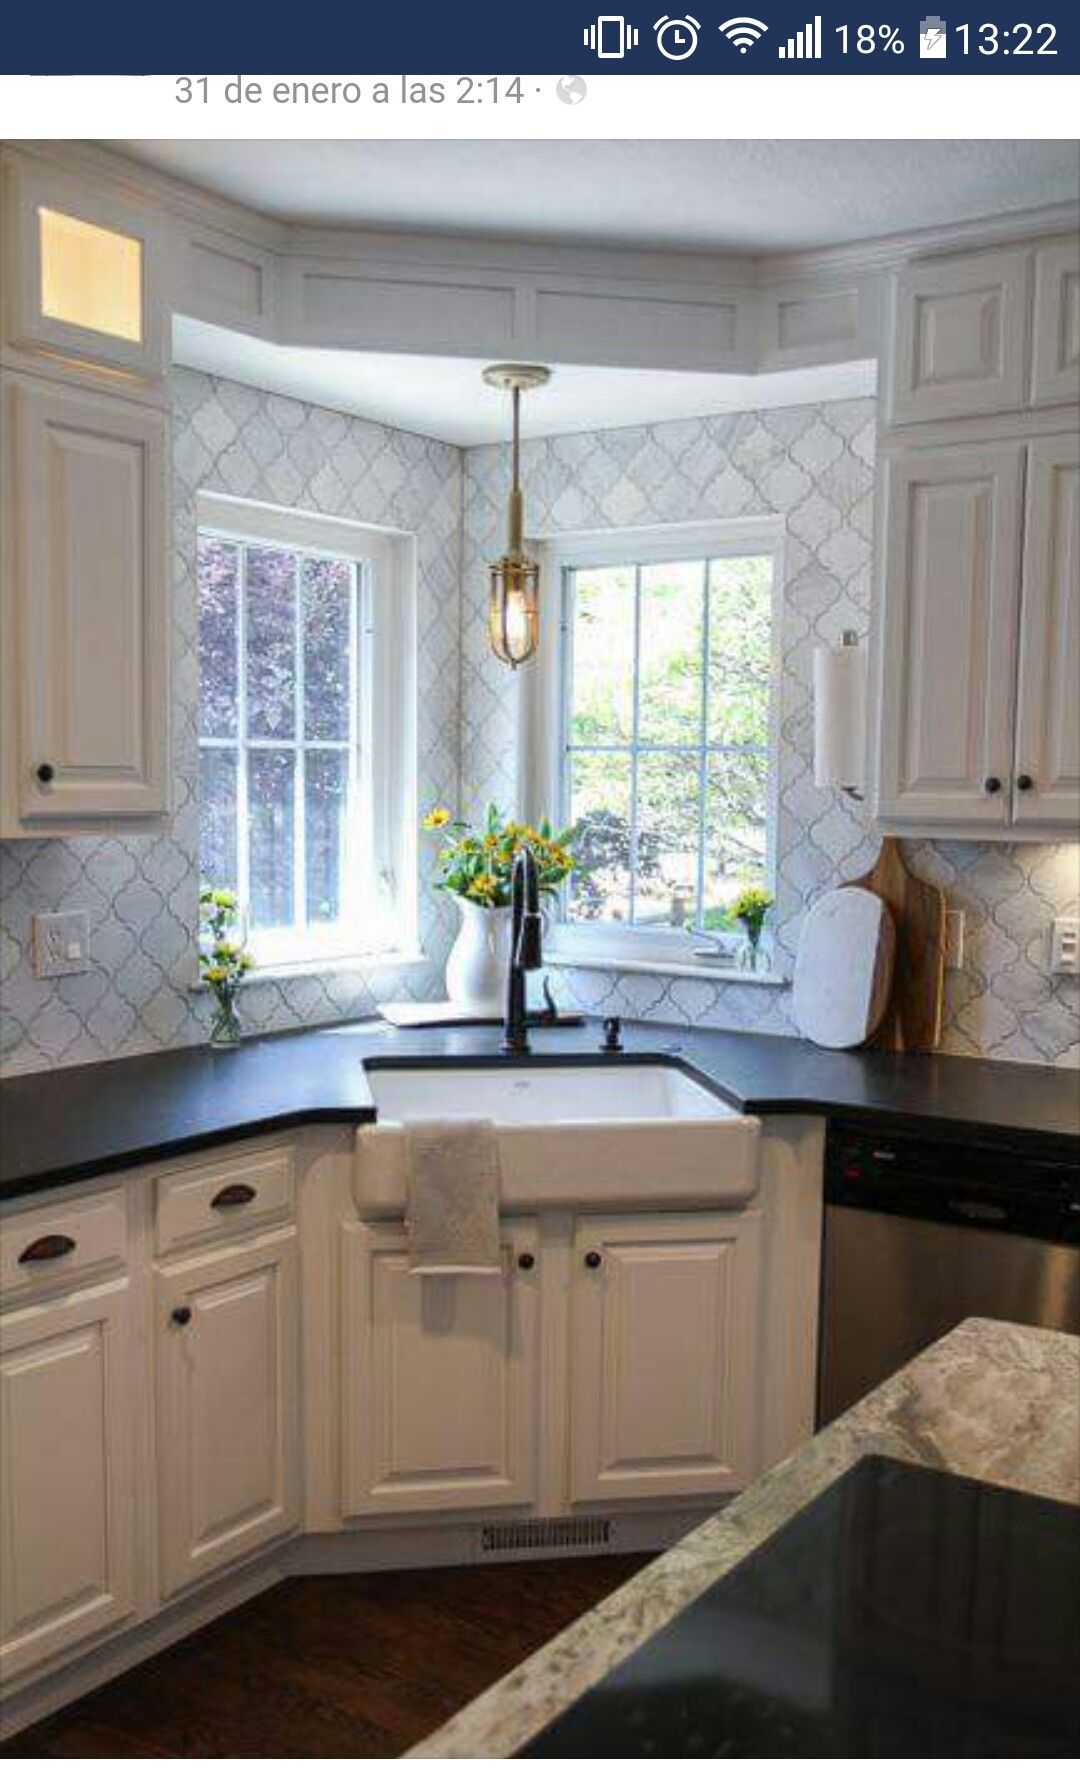 Corner Farmhouse Sink Modern Farmhouse Kitchens Kitchen Corner Kitchen Remodel